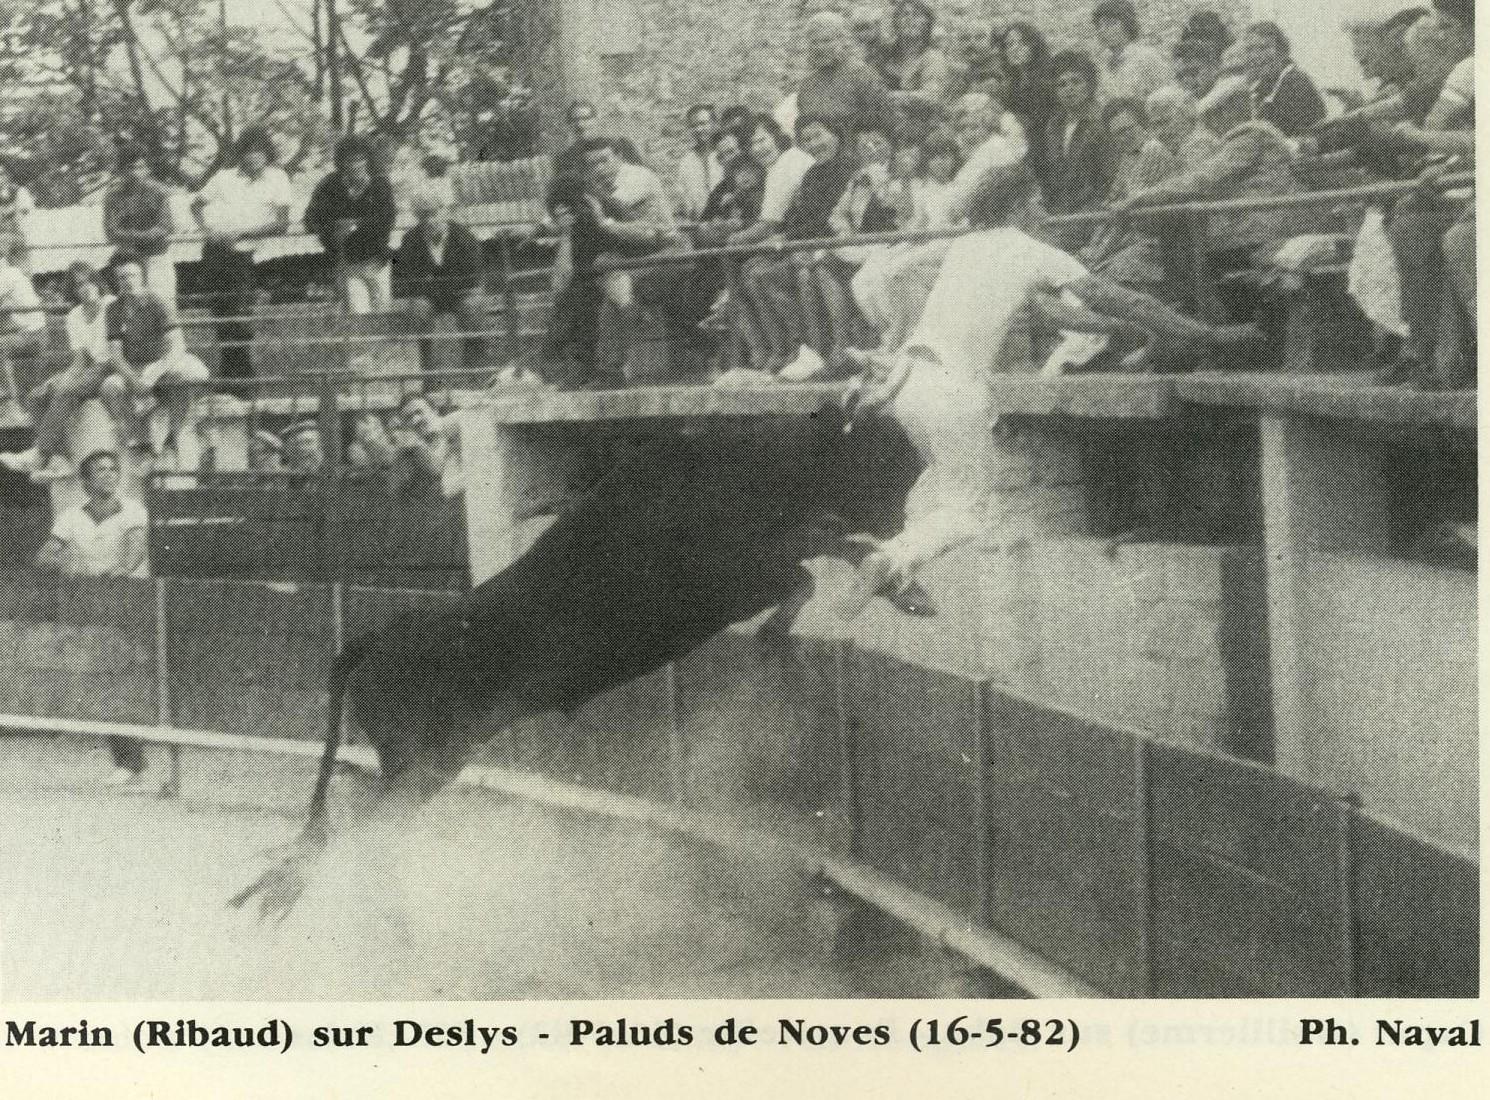 Marin ribaud f deslys 16 05 1982